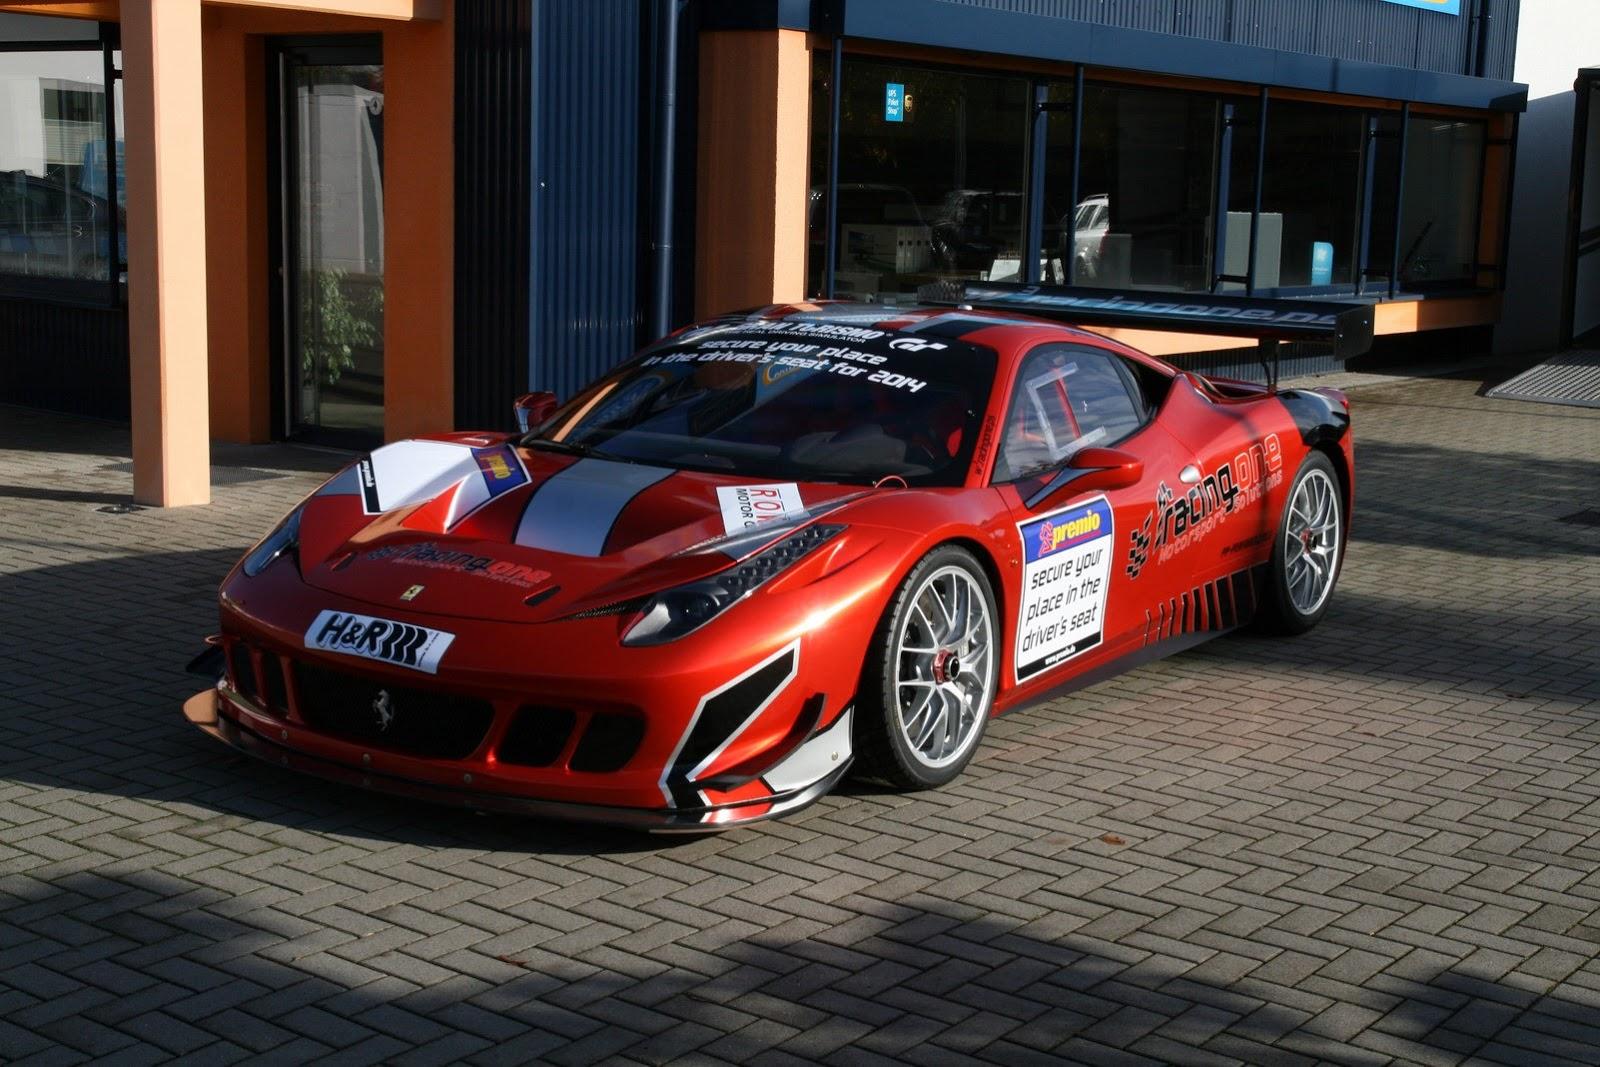 http://lh6.ggpht.com/-48IOdkPYaVo/UpNo-kkESHI/AAAAAAAPQDo/sAYN19JHh7g/s1600/Ferrari-Competition-458-10%25255B2%25255D.jpg